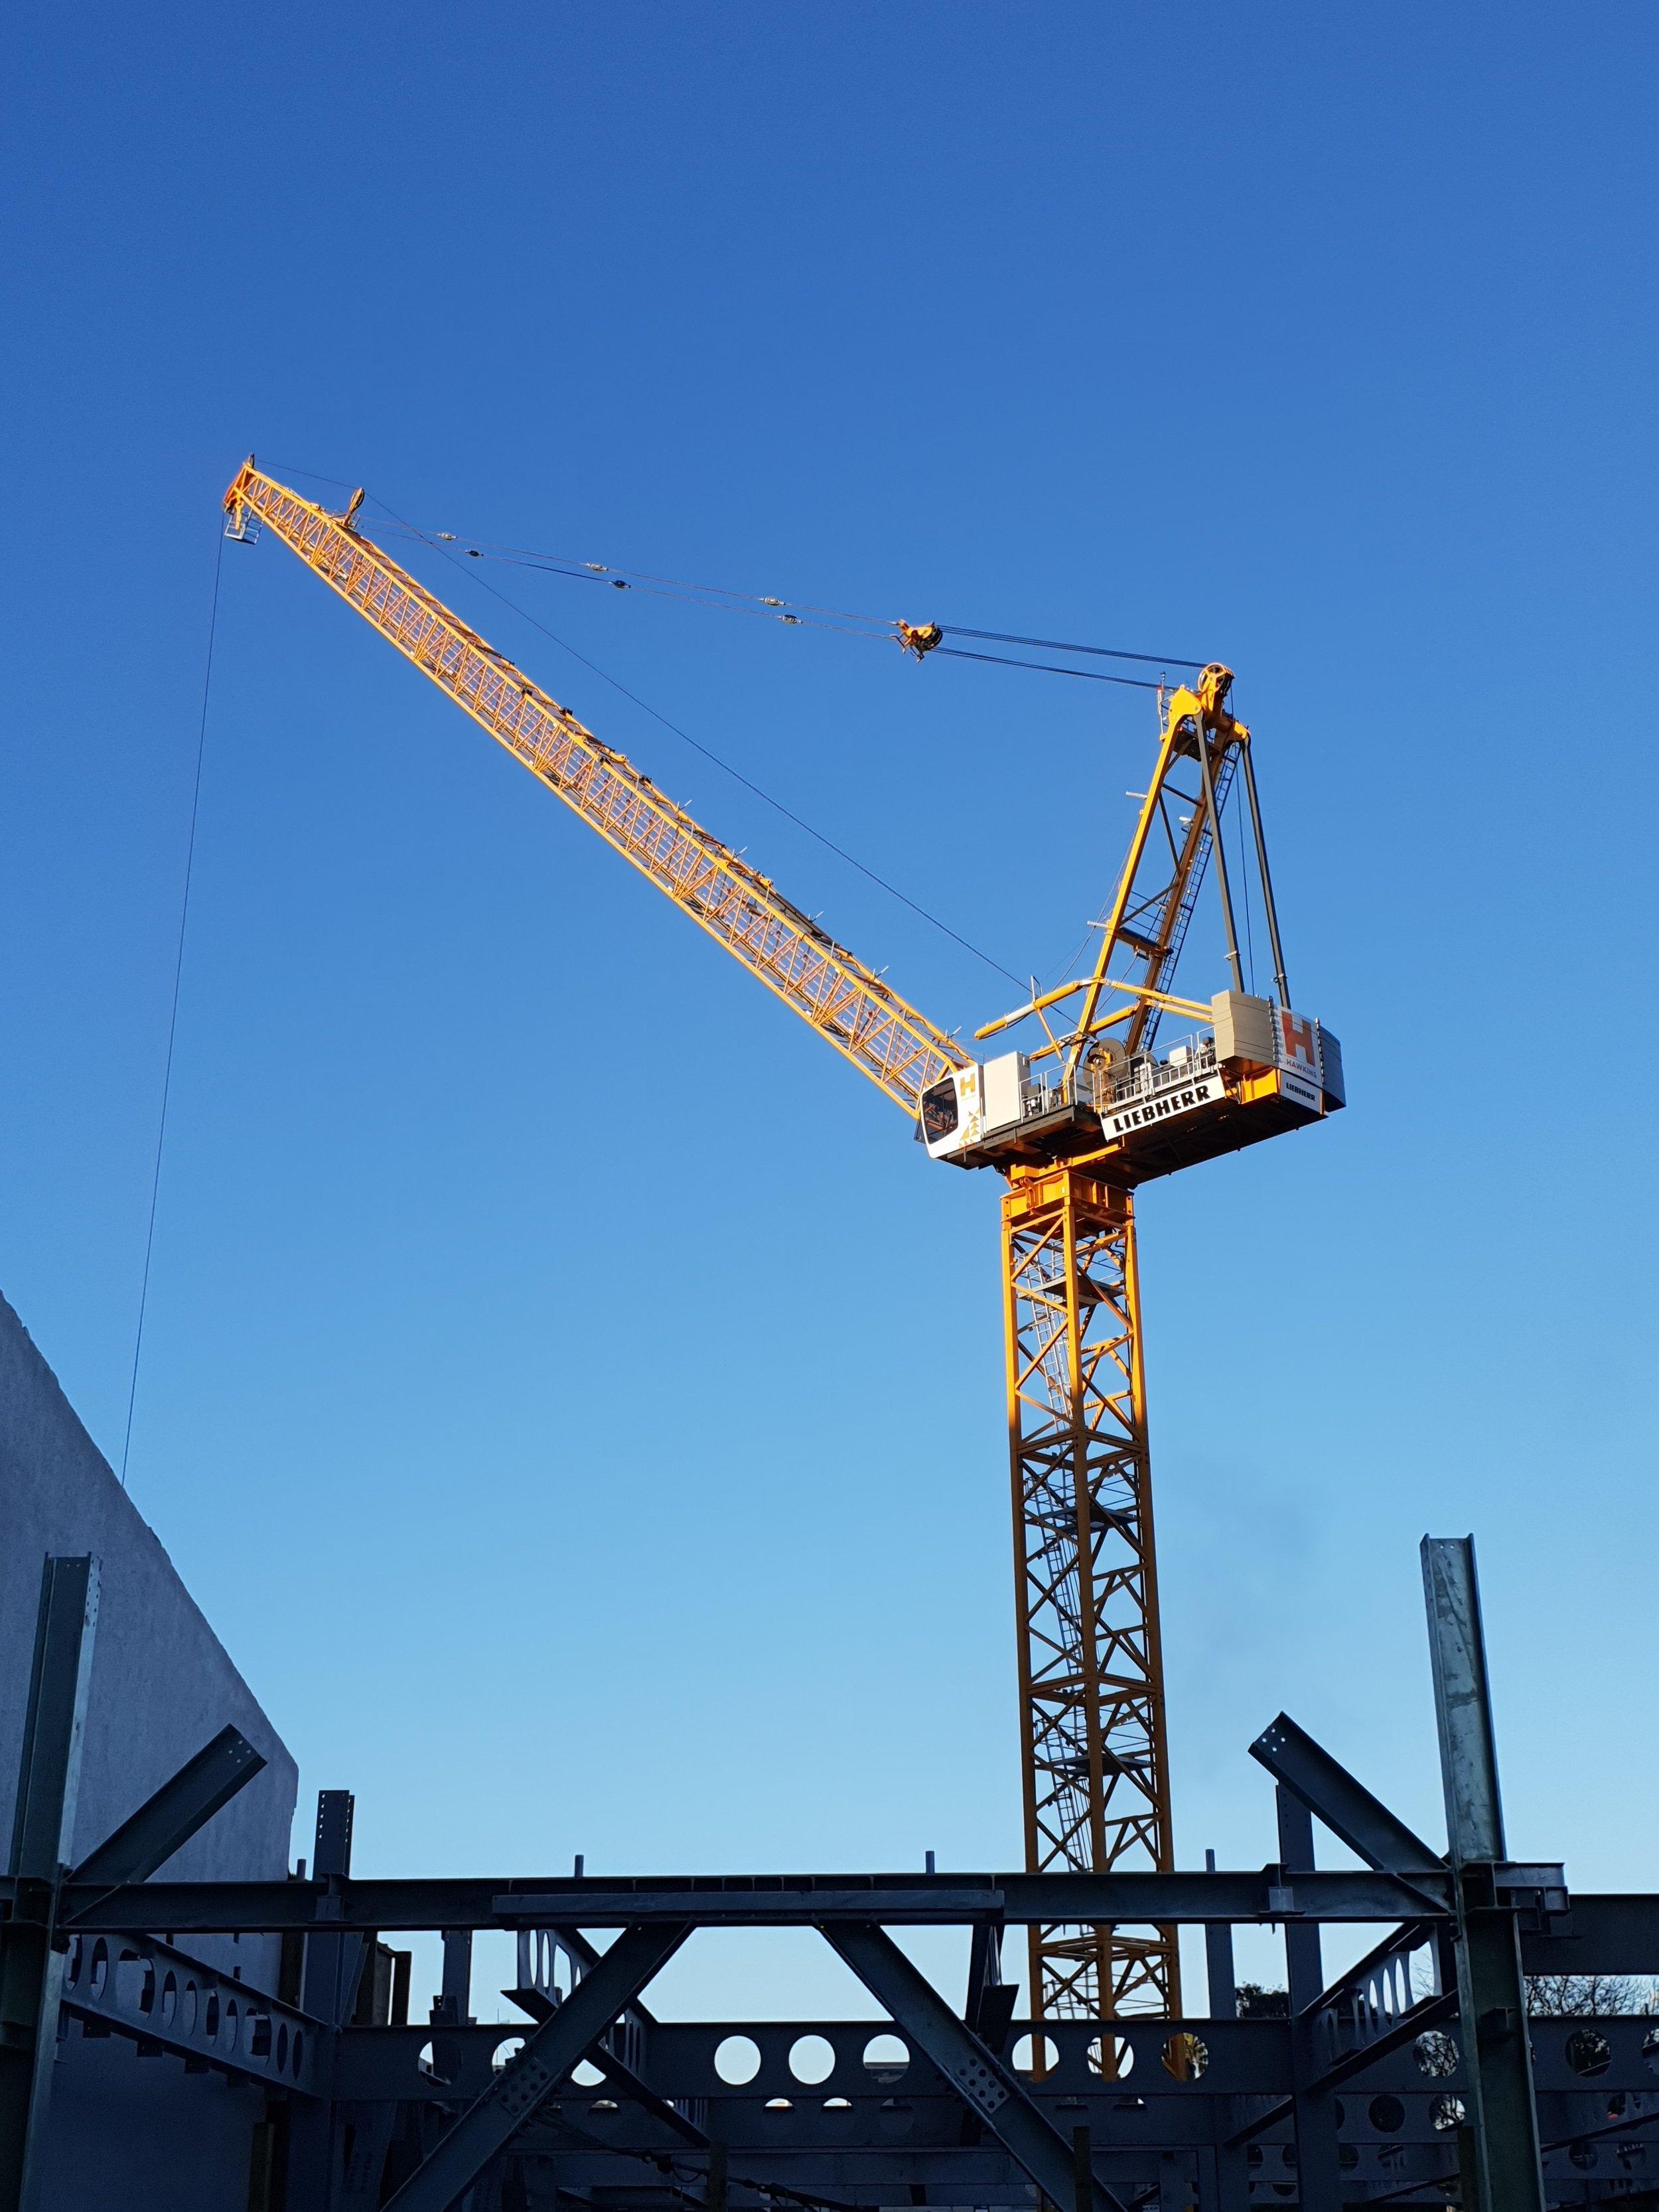 TCNZ - Hawkins Construction, Park Avenue 4.jpg